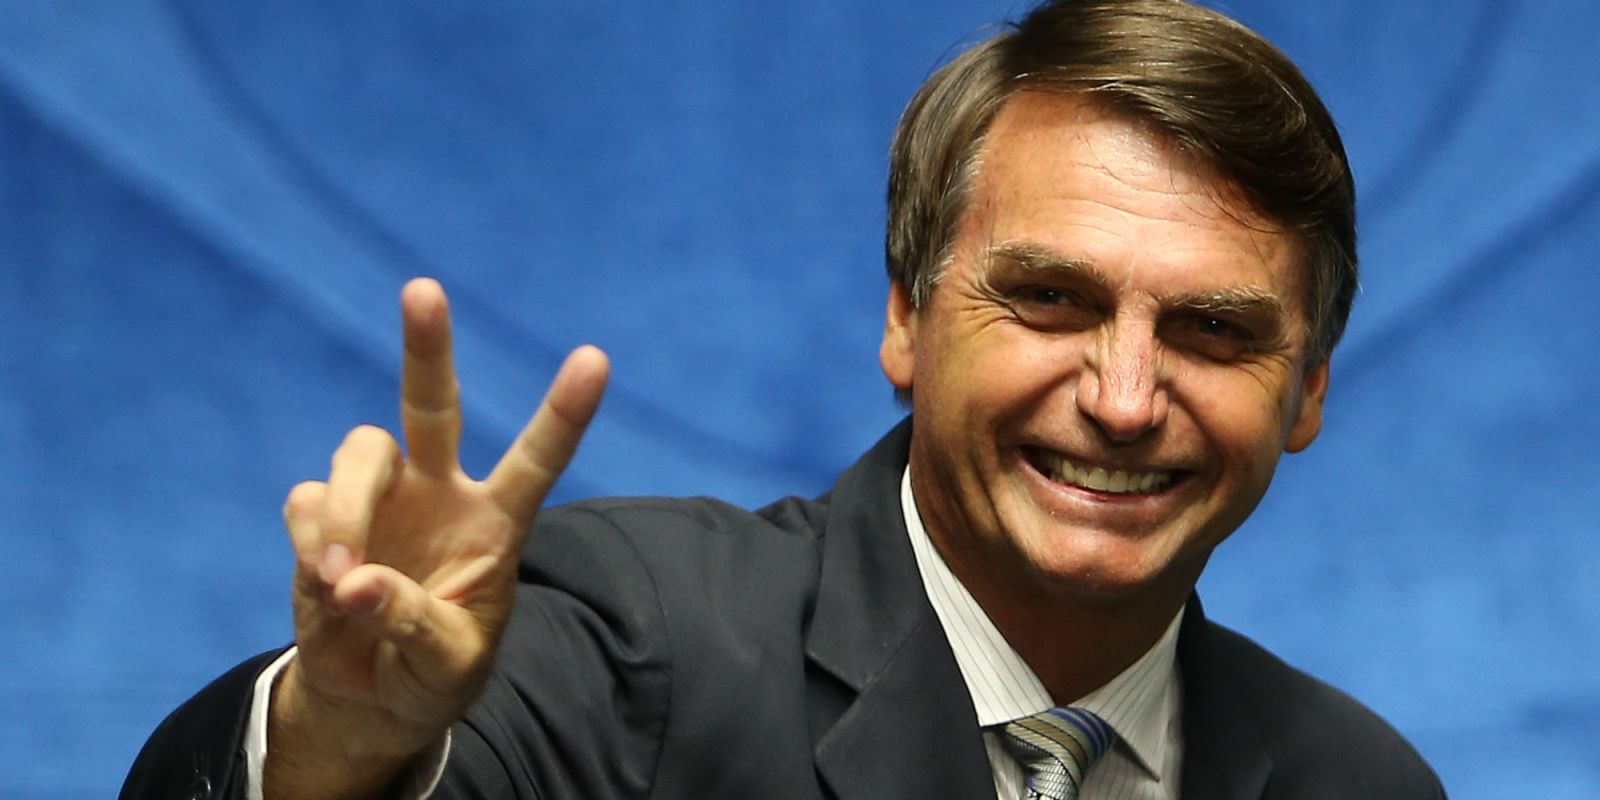 Jair Bolsonaro virá a Rondônia no próximo mês de agosto - VÍDEO